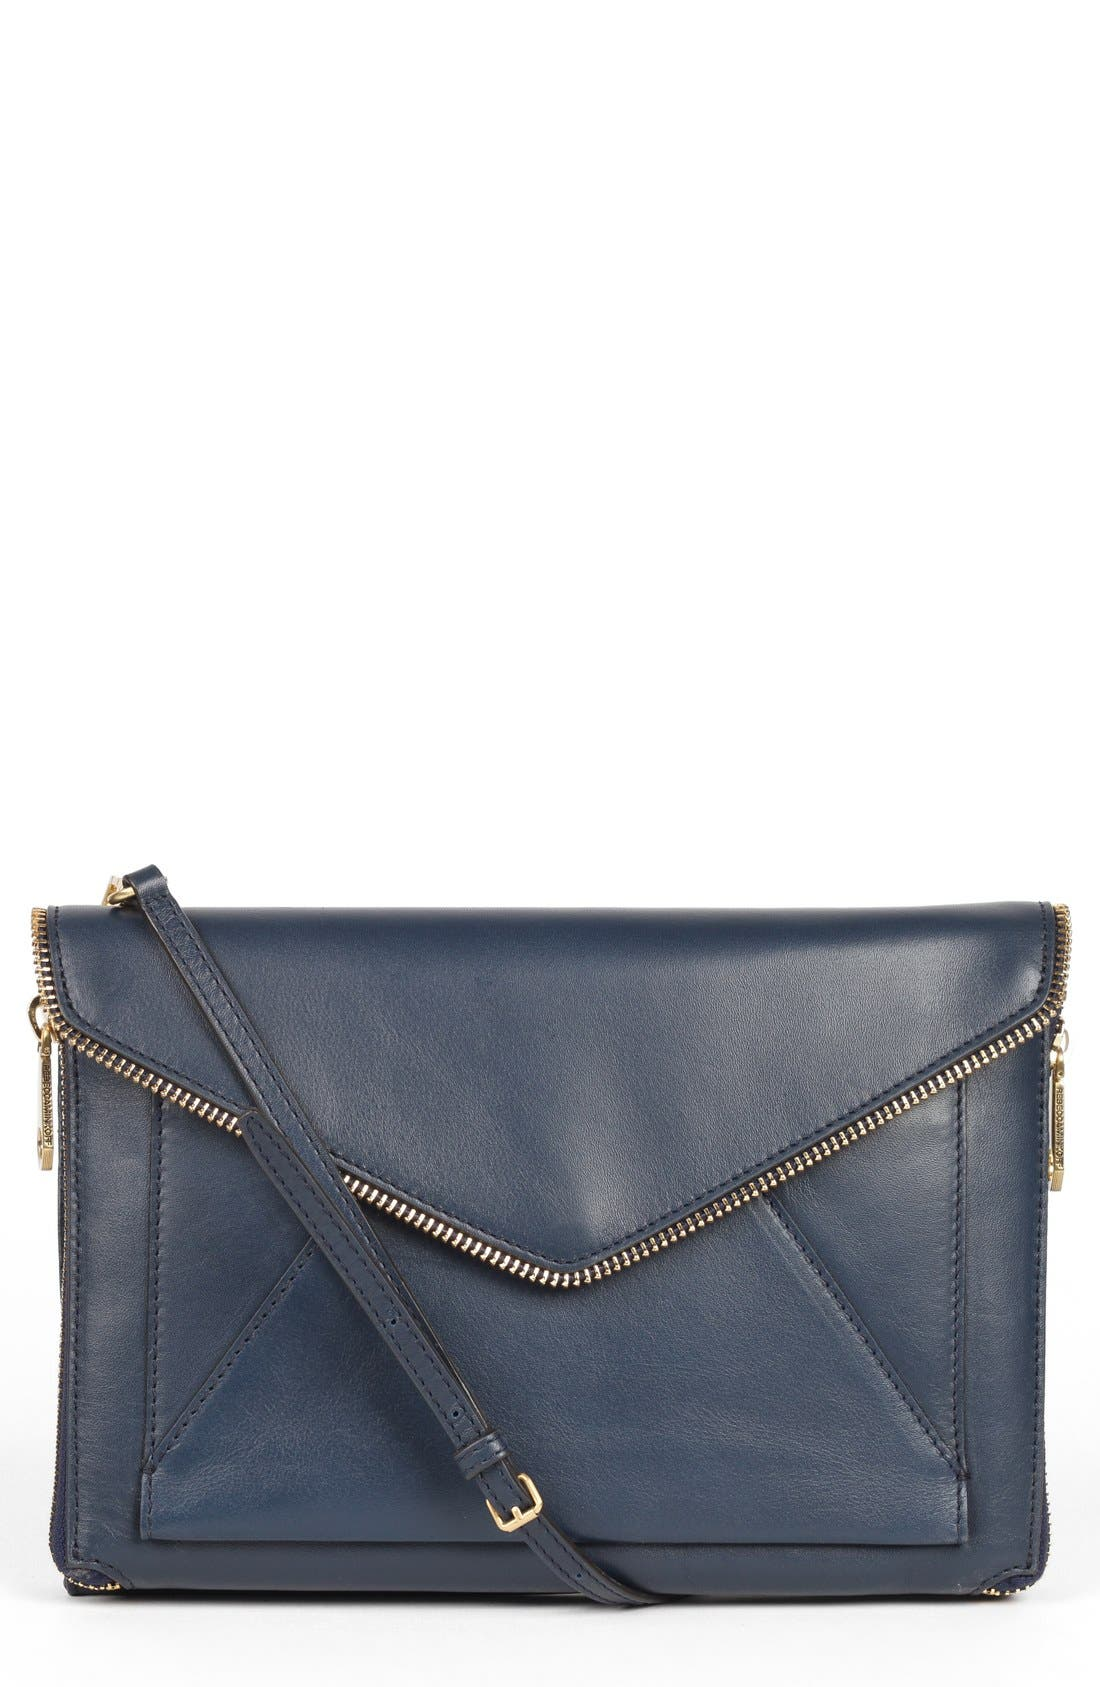 Alternate Image 1 Selected - Rebecca Minkoff 'Marlow' Bag